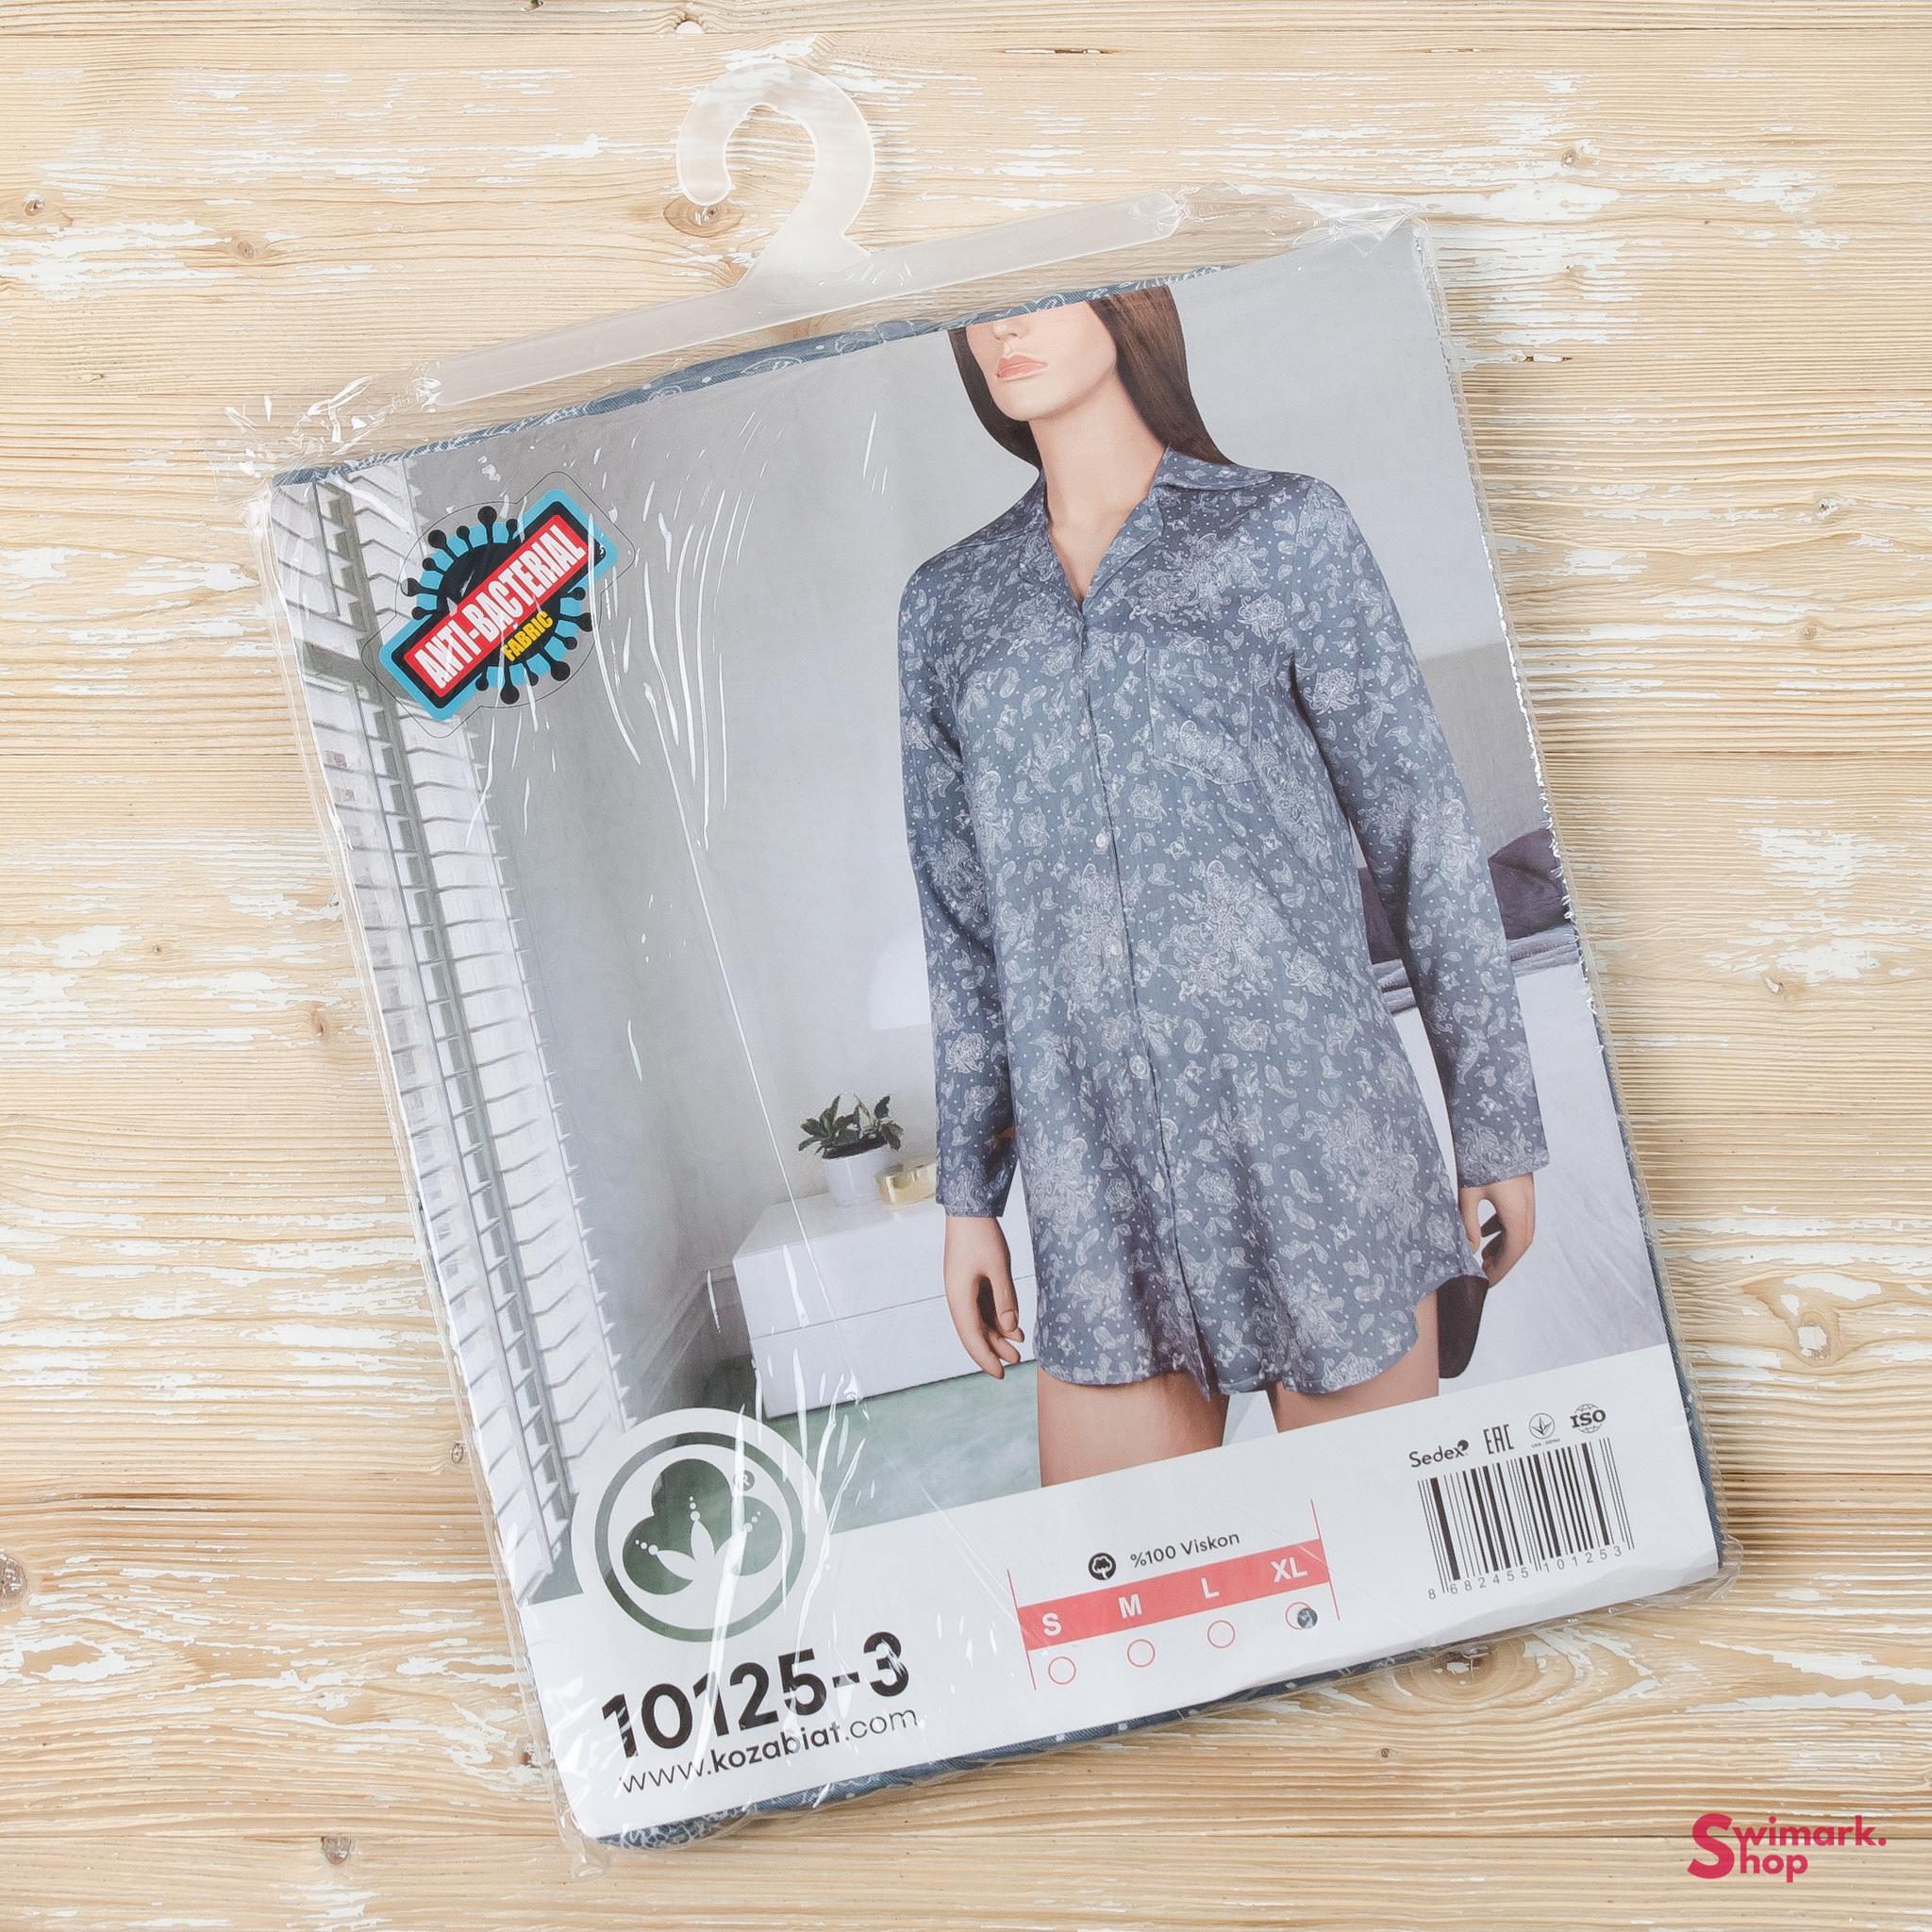 Пижамы Рубашка женская 10125-3 DSC_7117.jpg